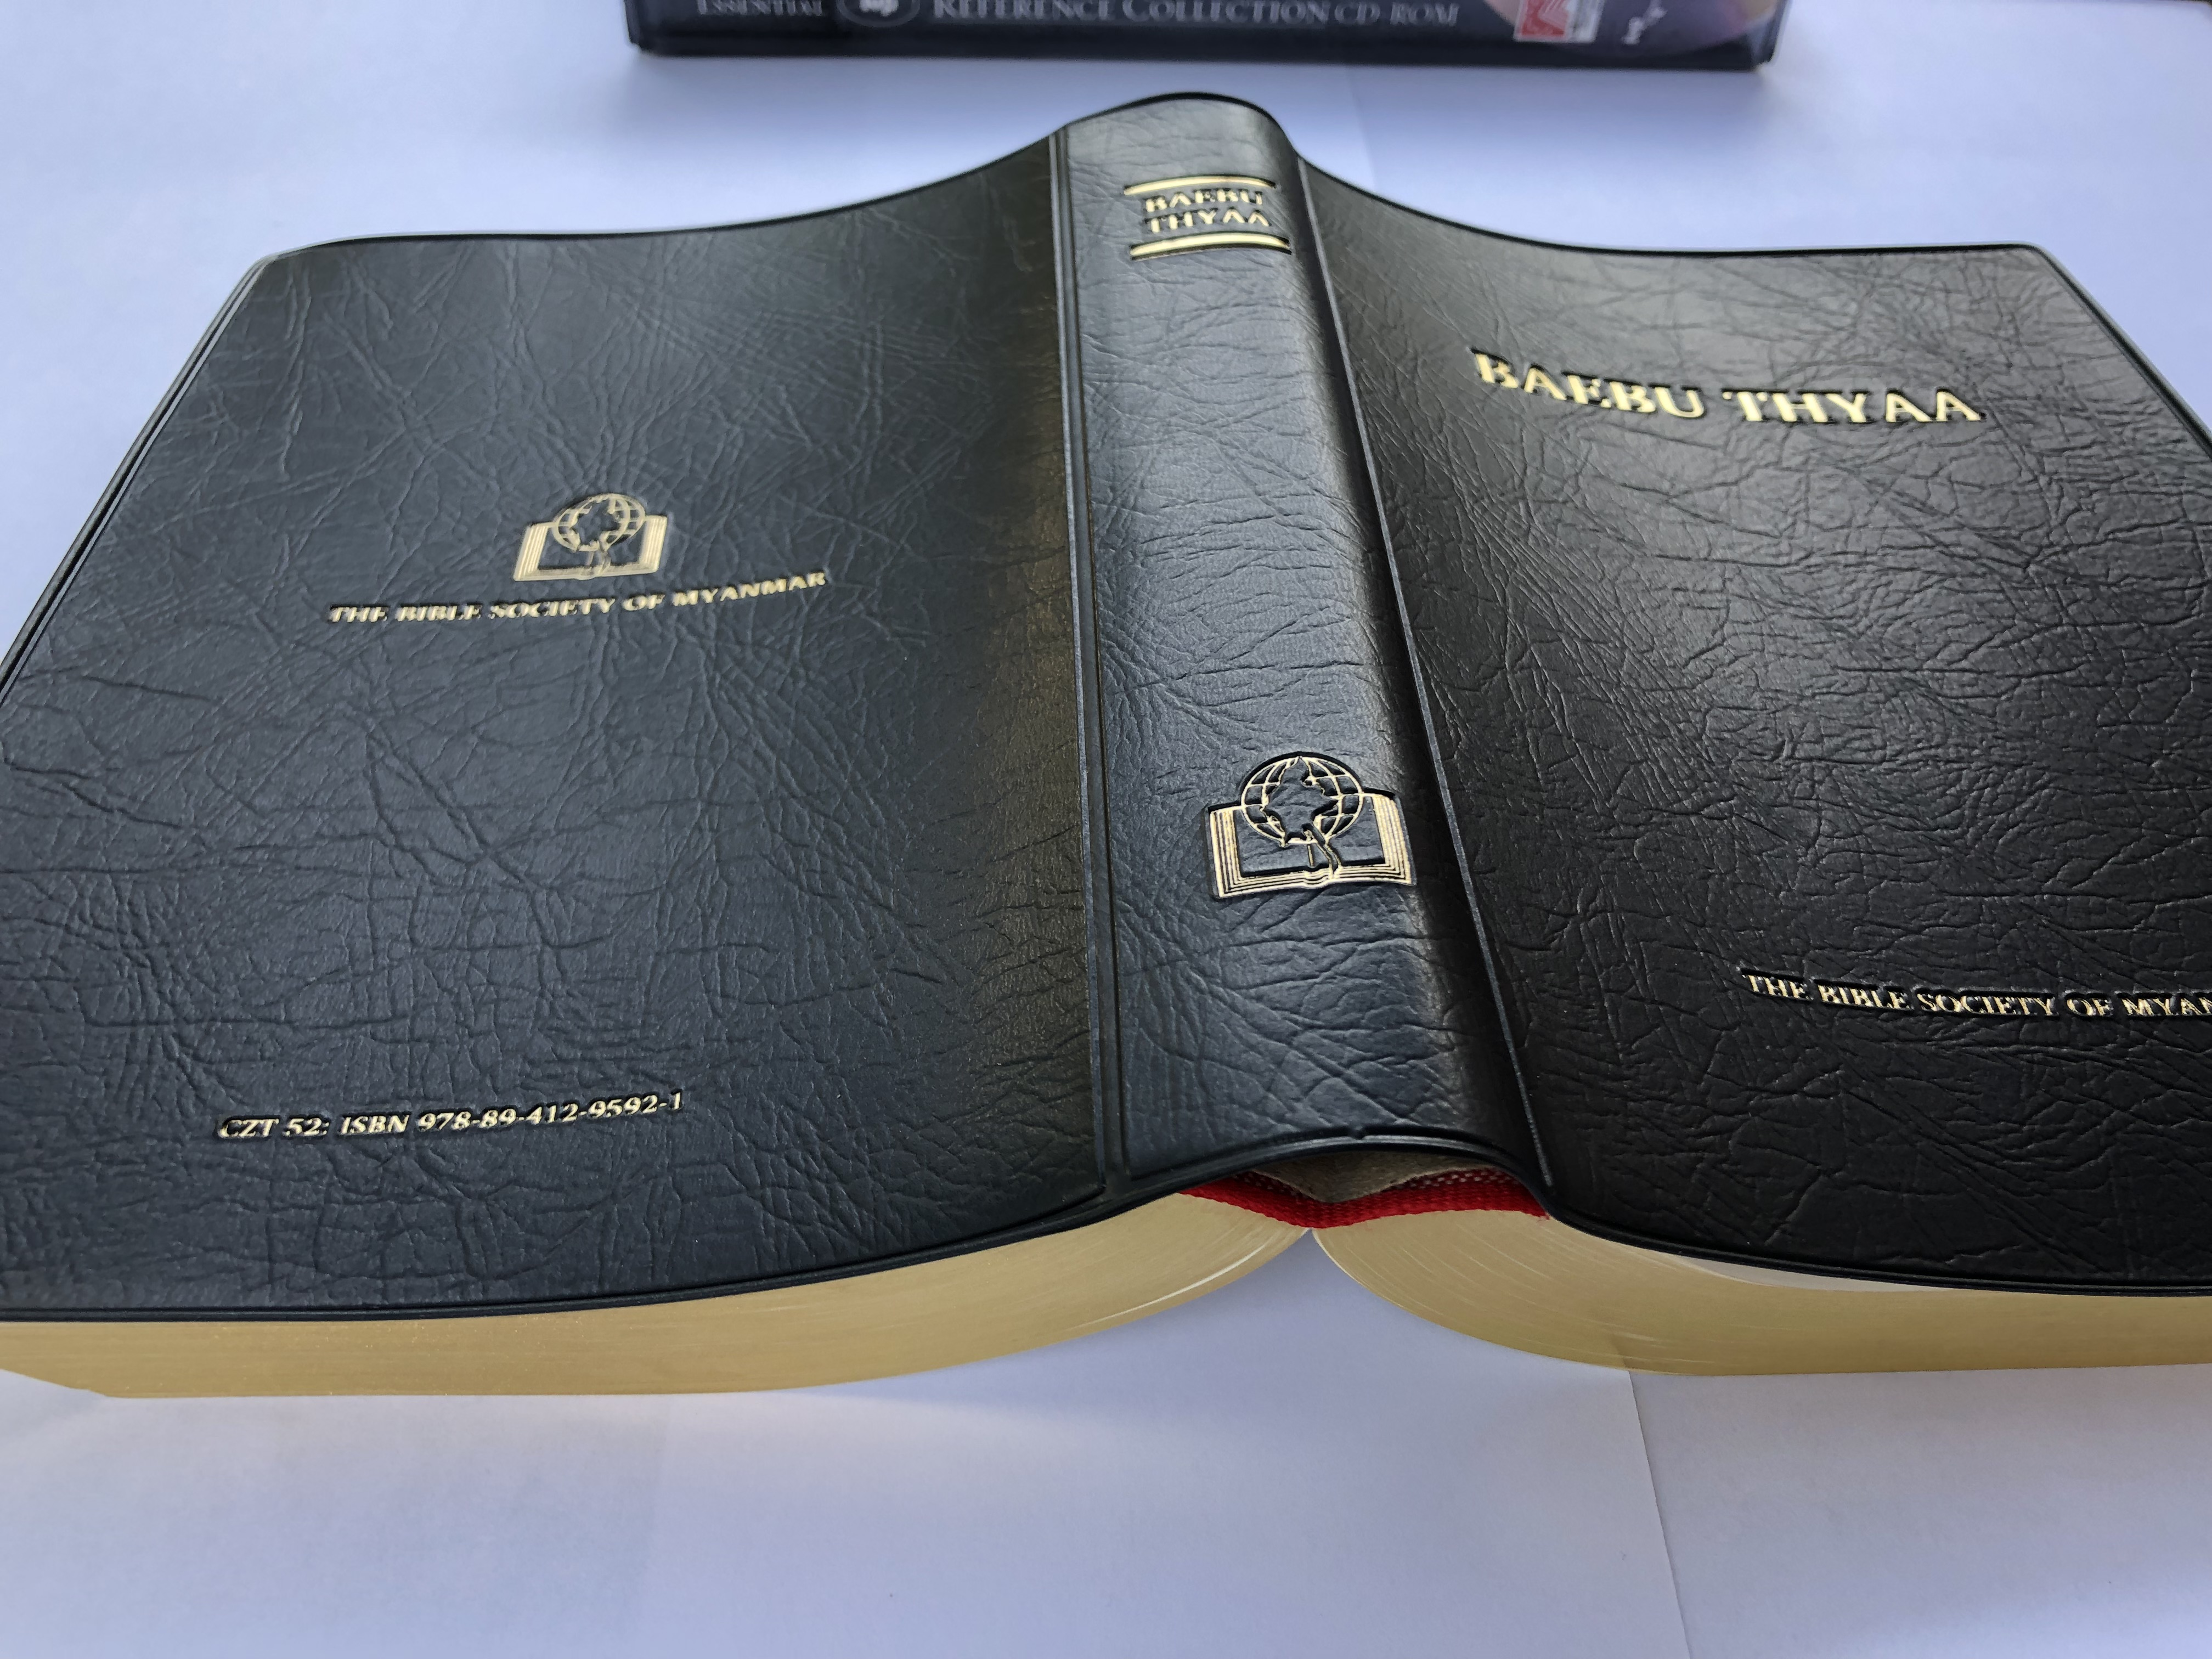 Baebu Thyaa  The Holy Bible in Zotung Chin Language  Leather binding  Byakin Ryn te Byakin Thaw  Old and New Testaments  Bible Society of Myanmar  First print  2016